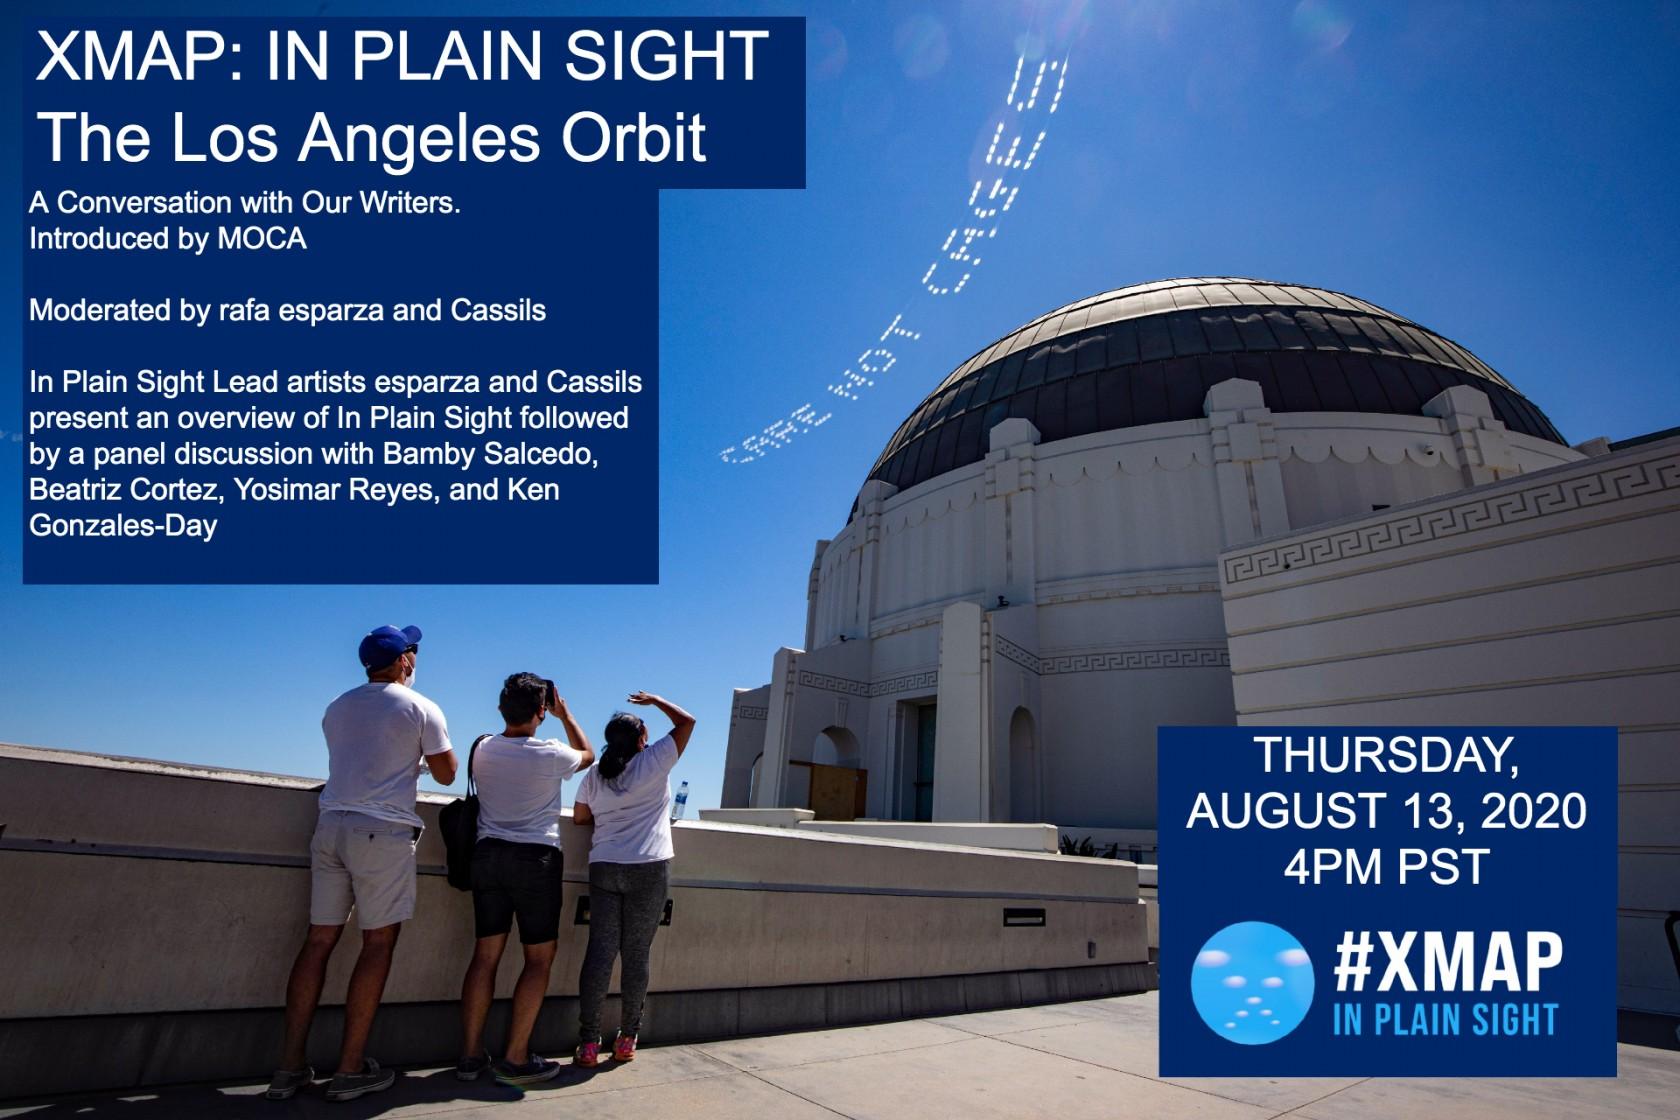 XMAP: In Plain Sight, The Los Angeles Orbit Panel